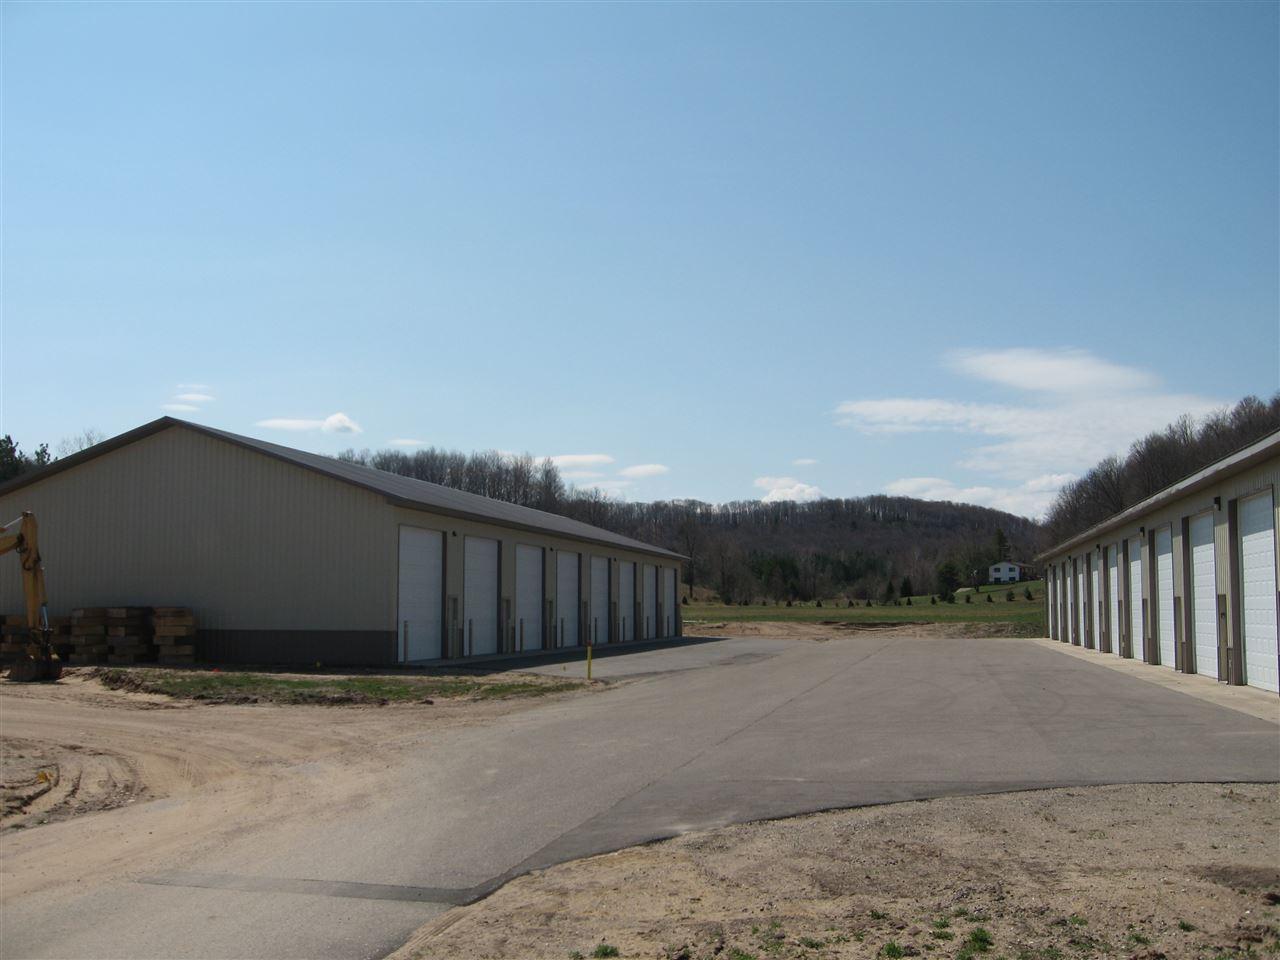 00094 Boyne Valley Storage Drive, Boyne City, MI 49712